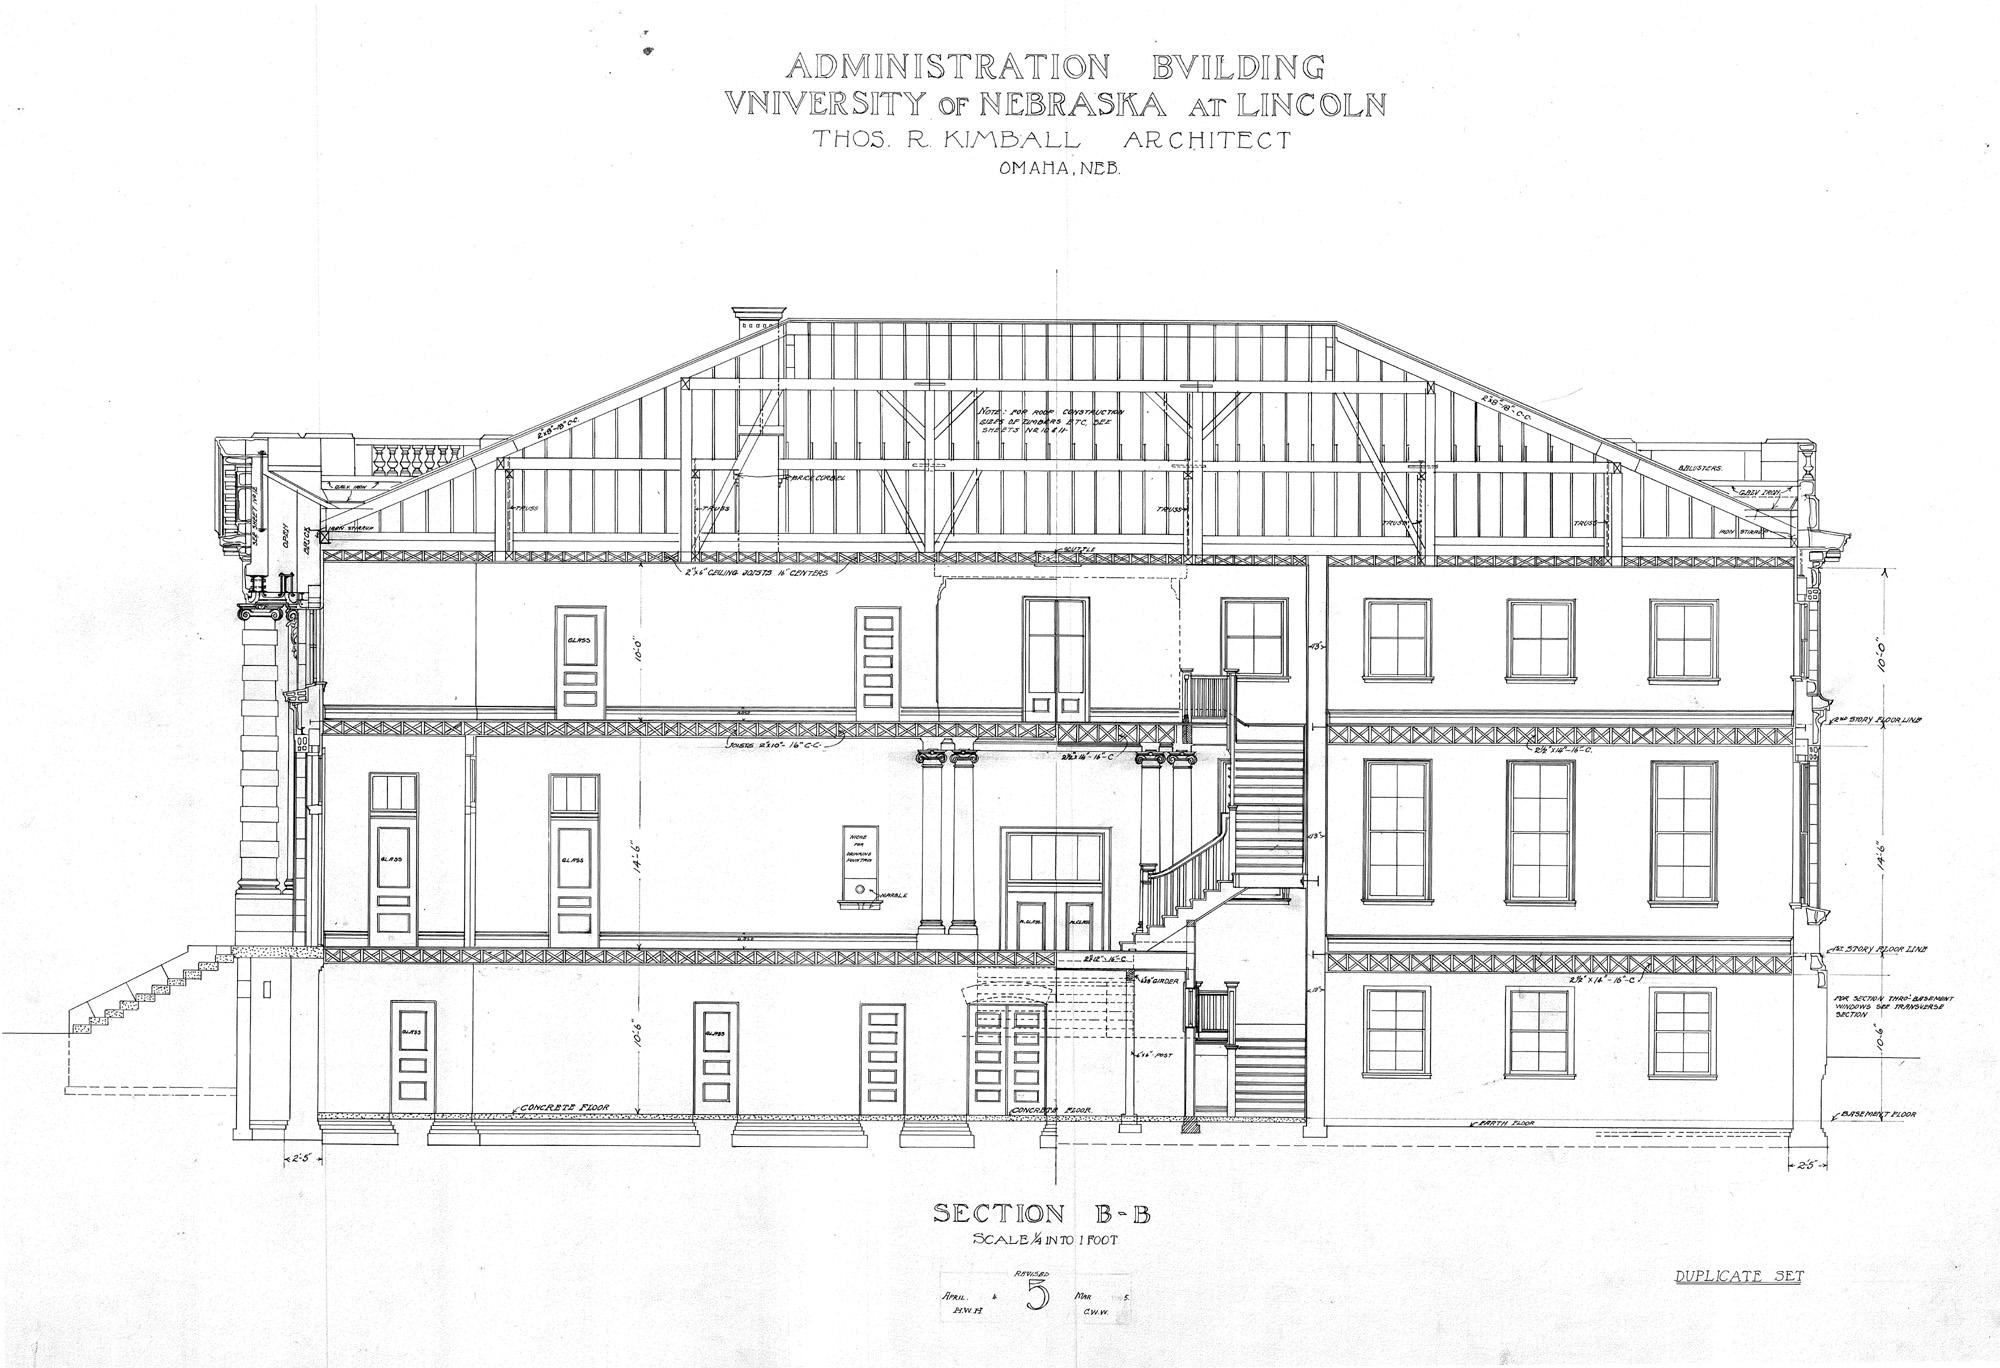 View Plan Image. UNL Historic Buildings   Administration Building  Old  Building Plans